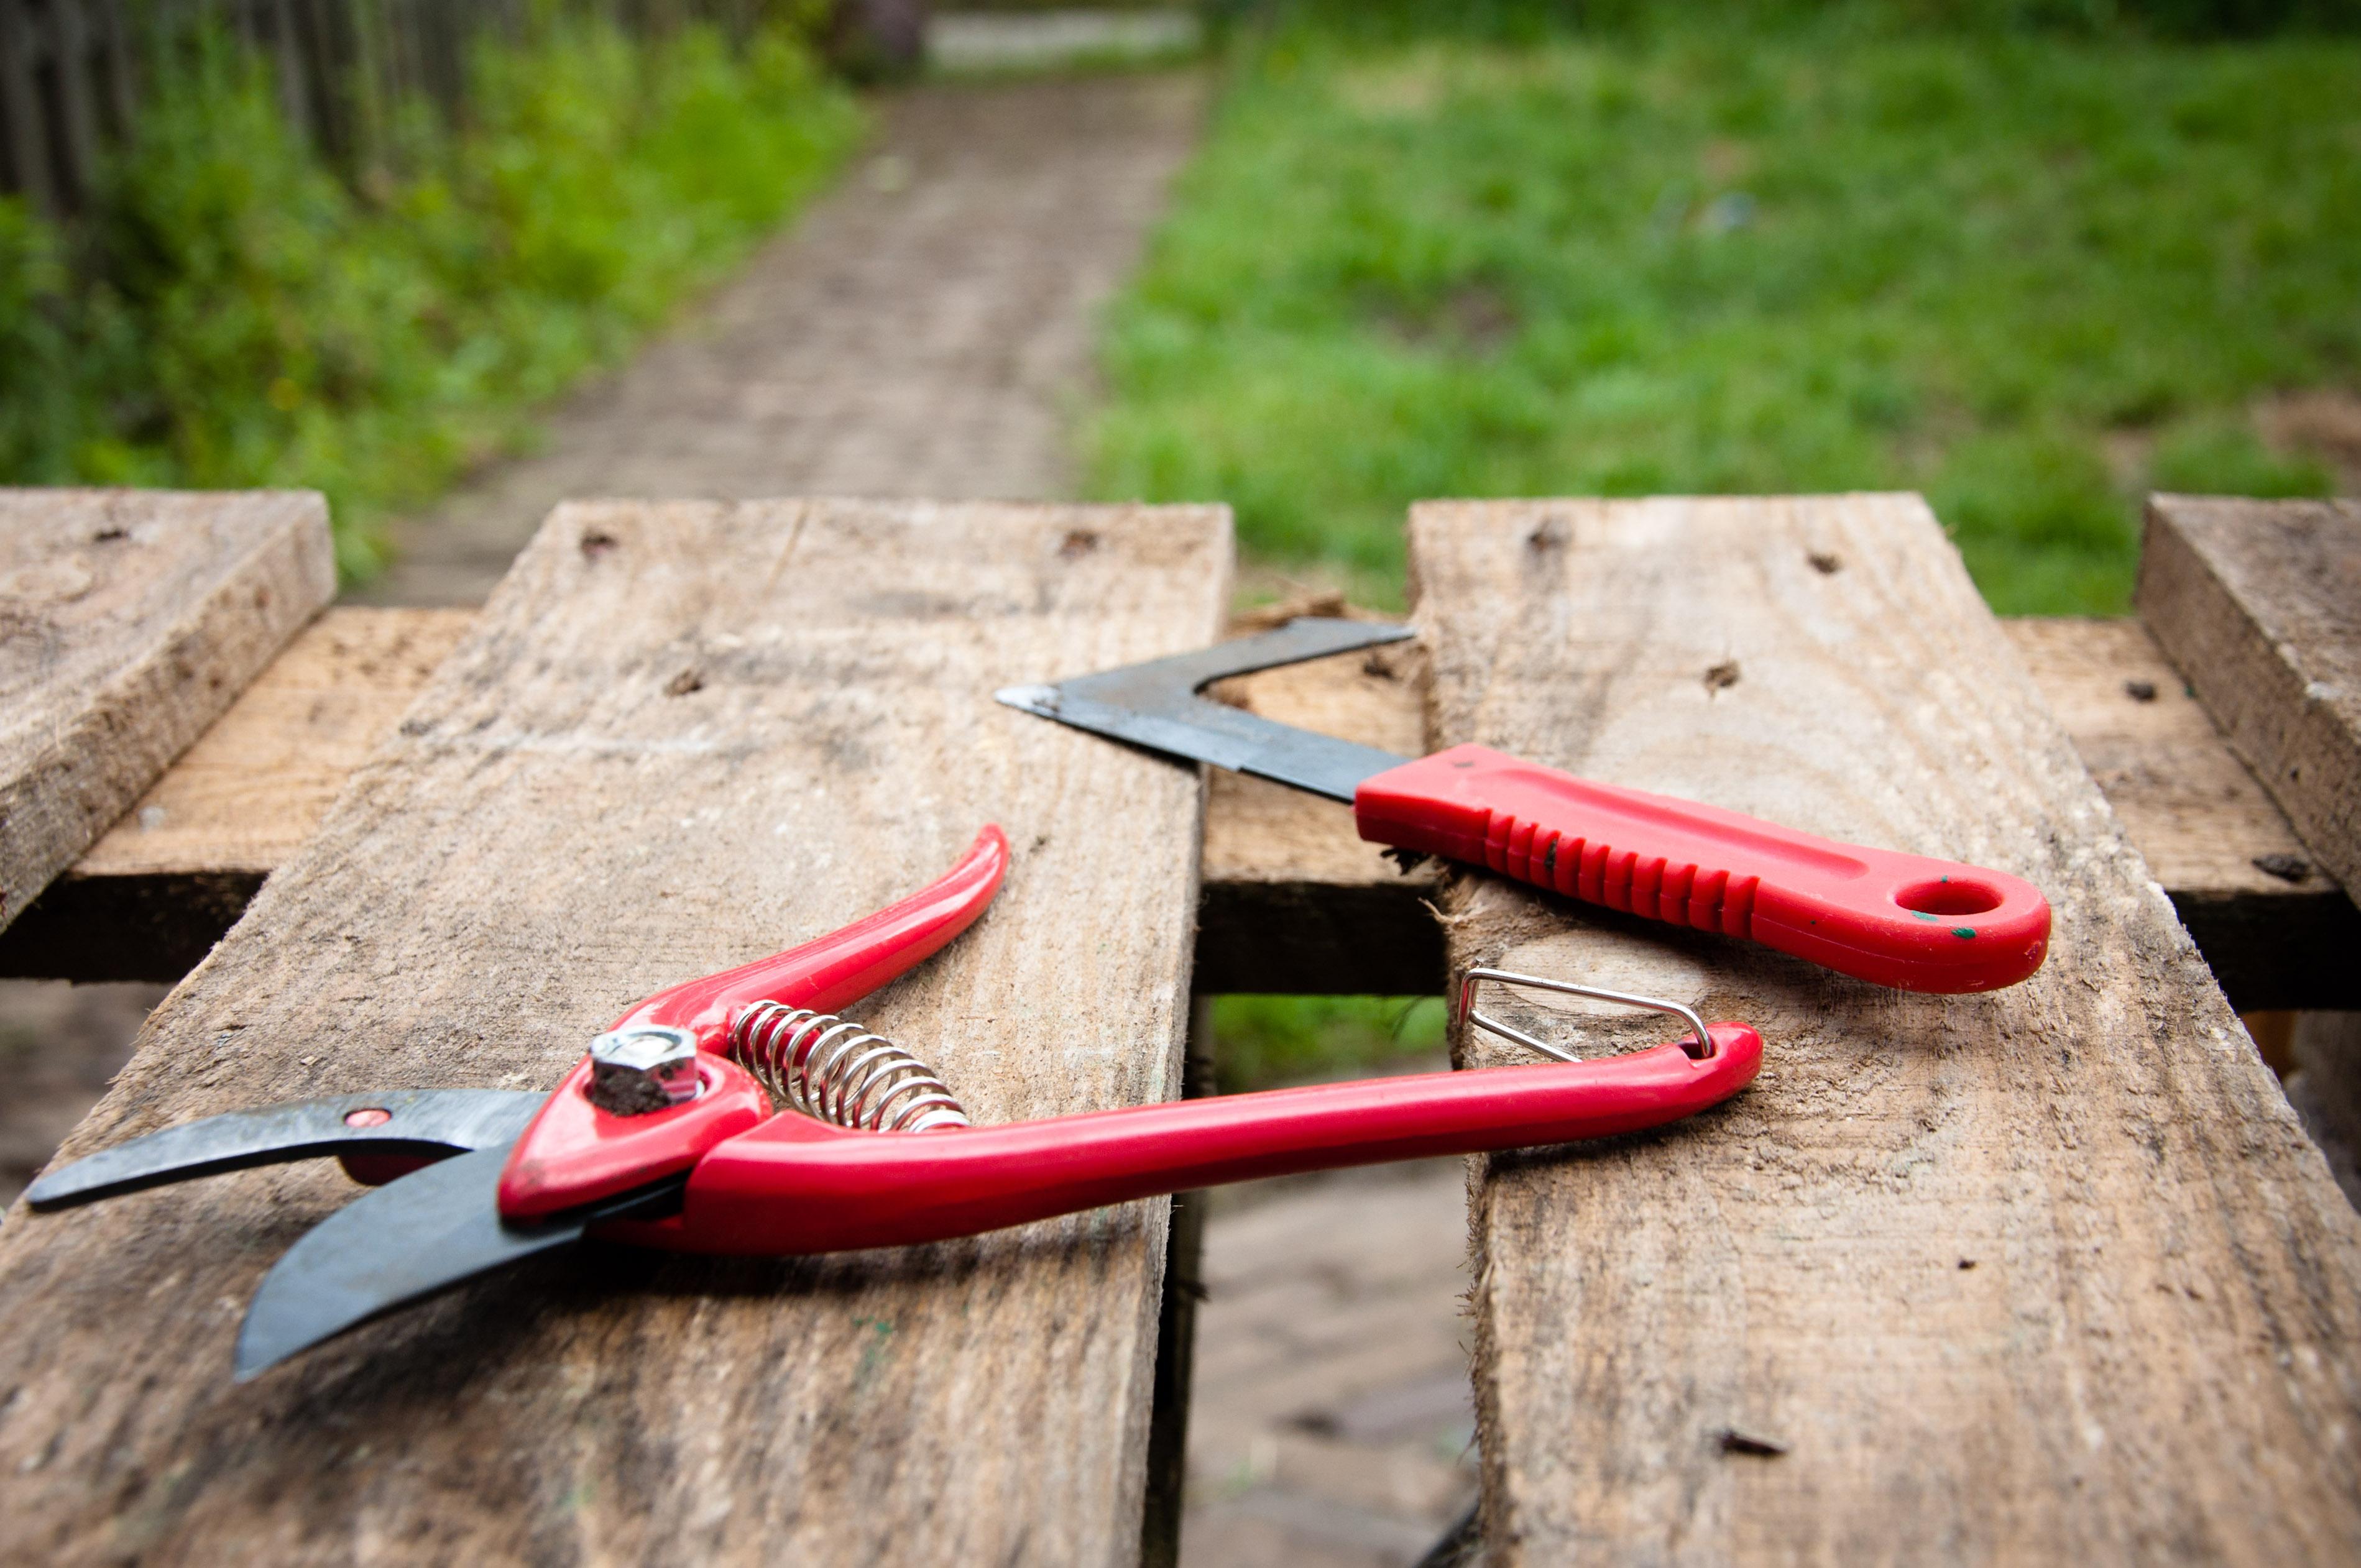 stockvault-gardening-tools132194